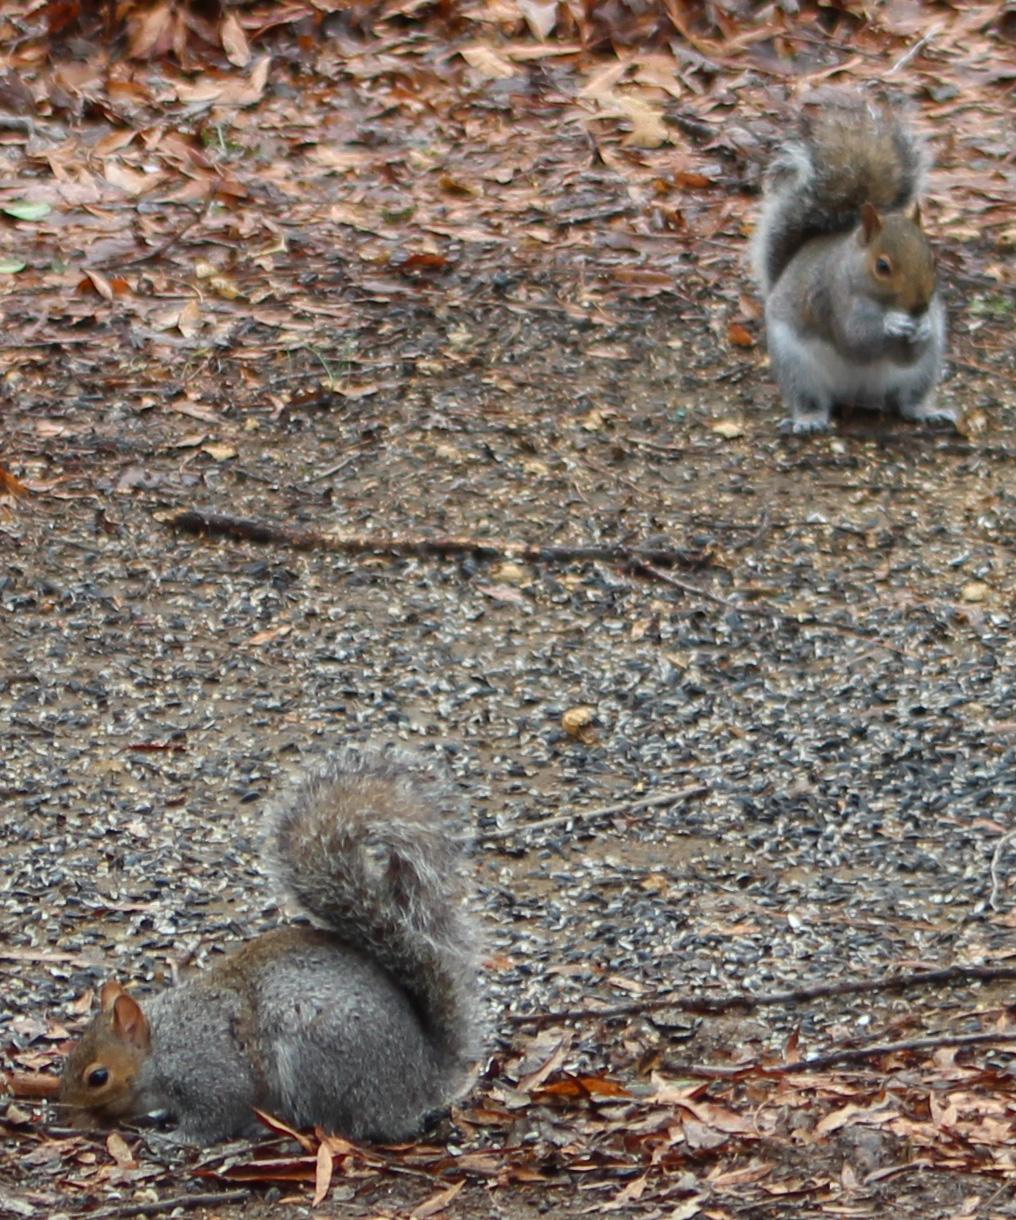 Squirrel 2 a